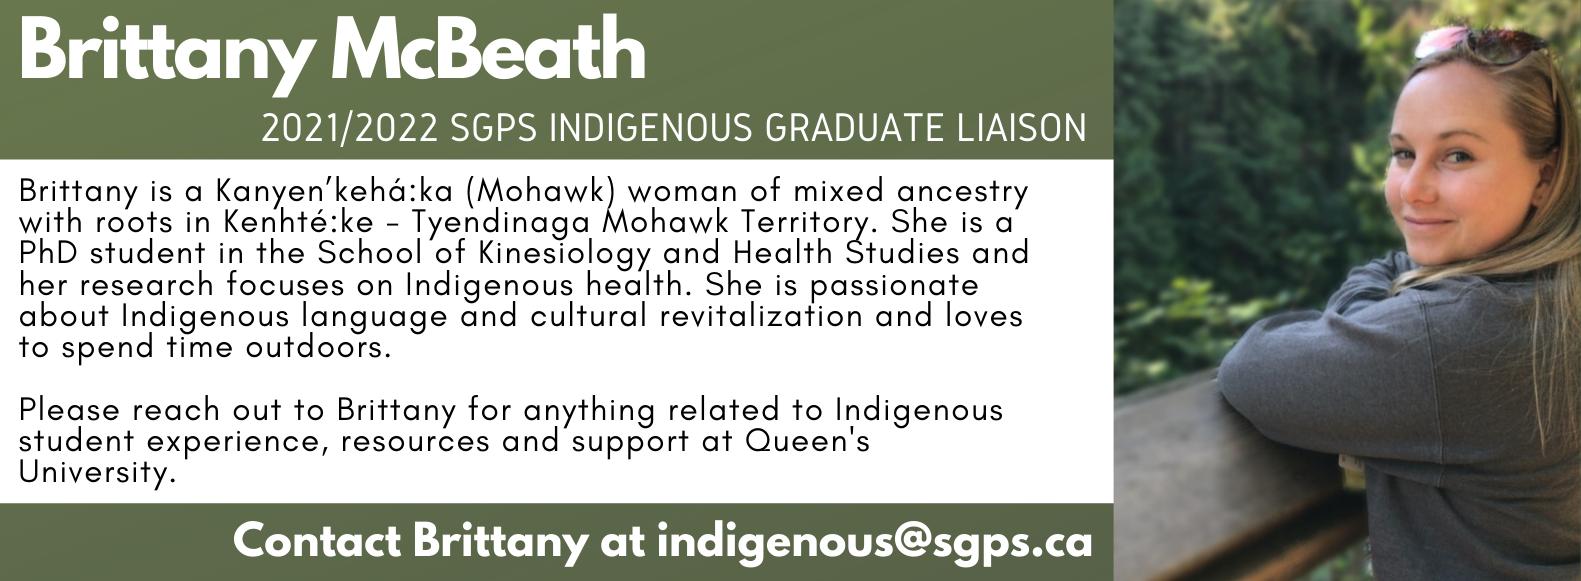 Brittany McBeath, SGPS Indigenous Graduate Liaison. Contact Brittany at indigenous@sgps.ca